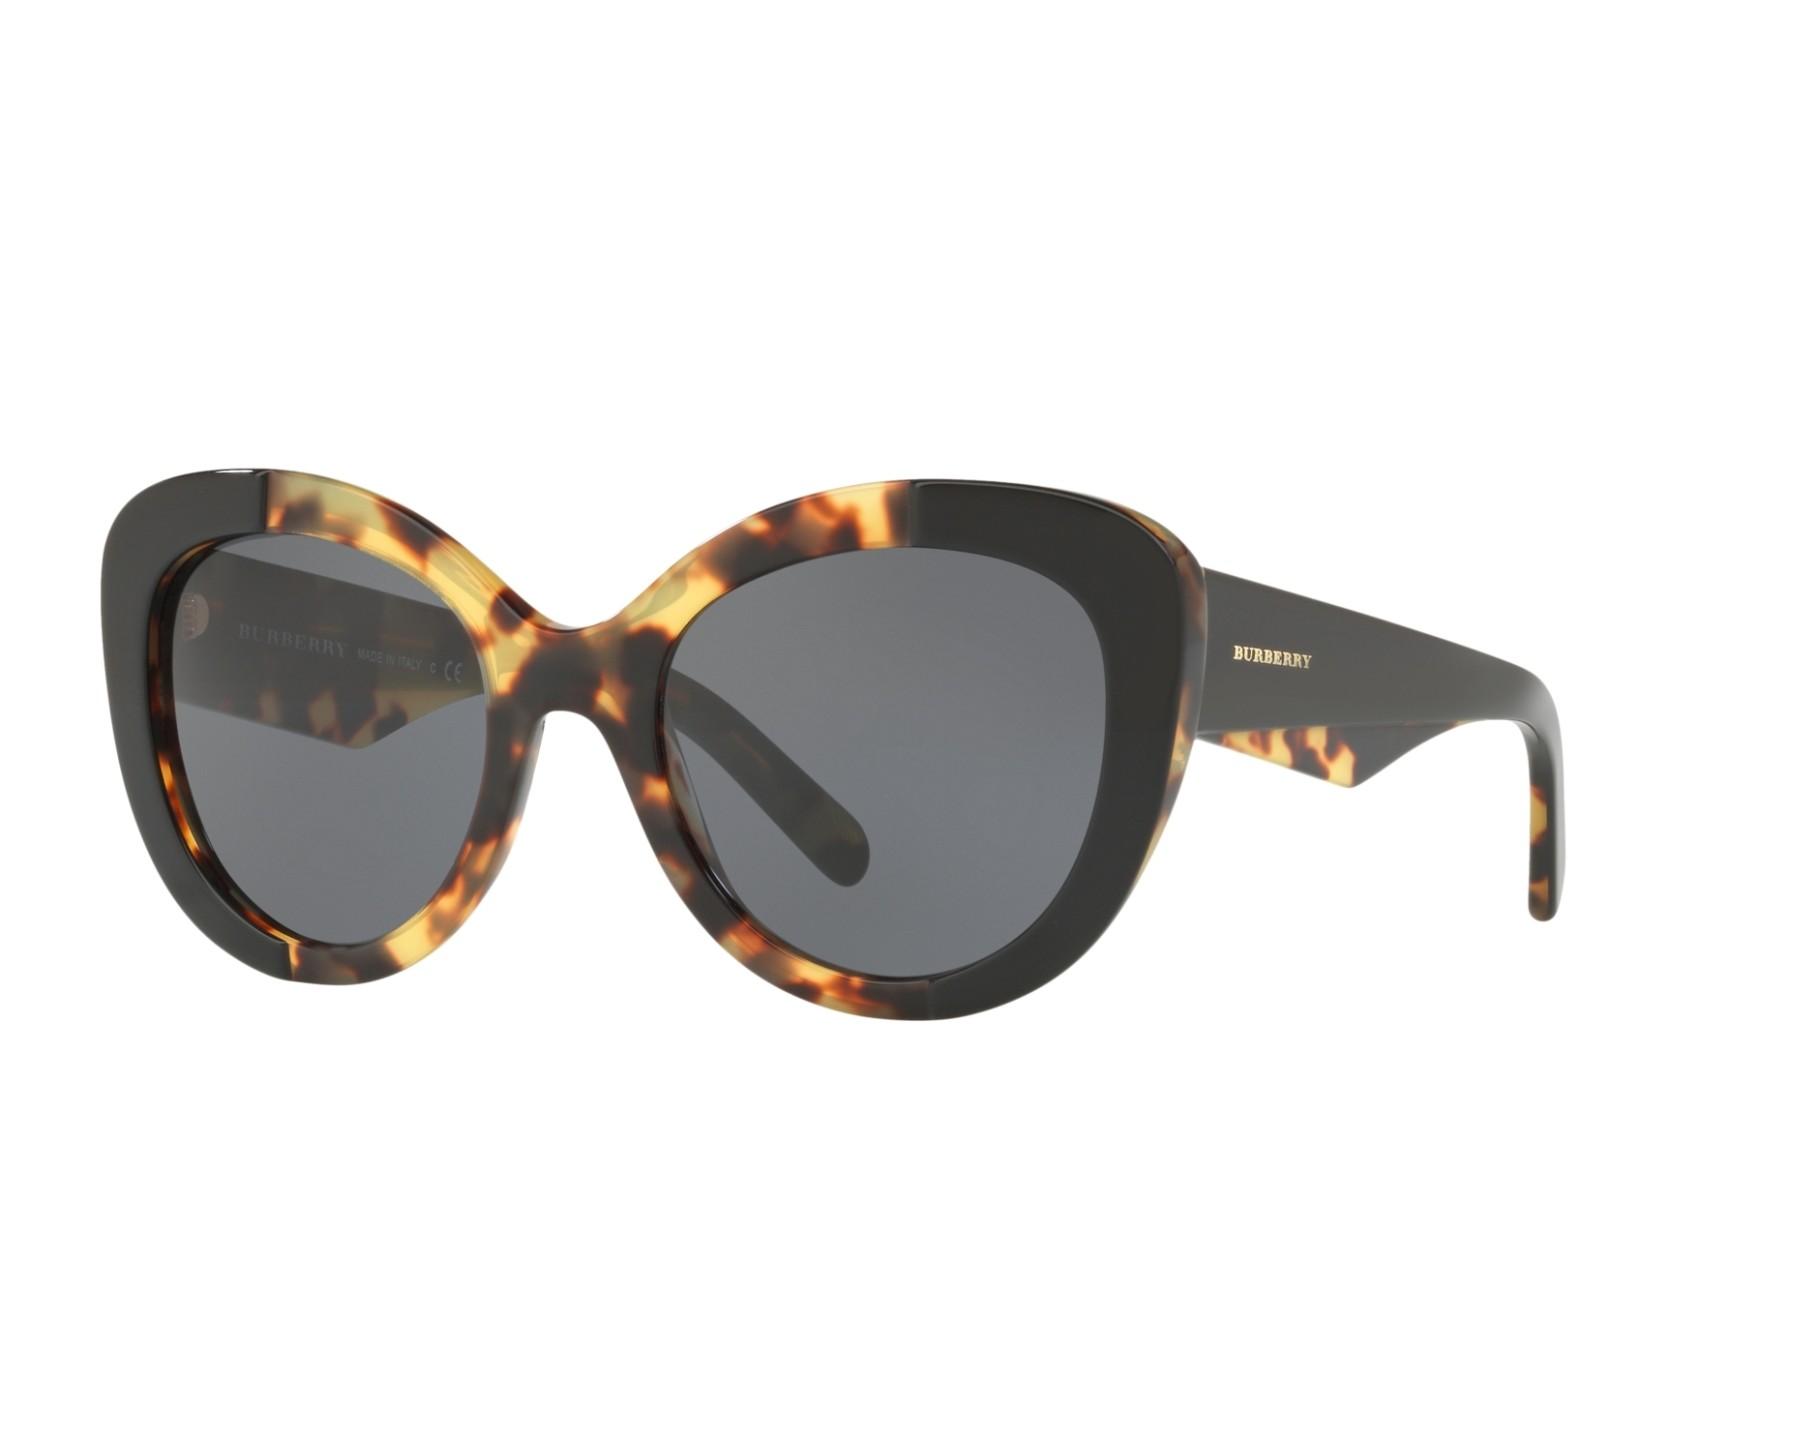 c8e0a77d15 Gafas de sol Burberry BE-4253 364987 54-21 Havana Negra